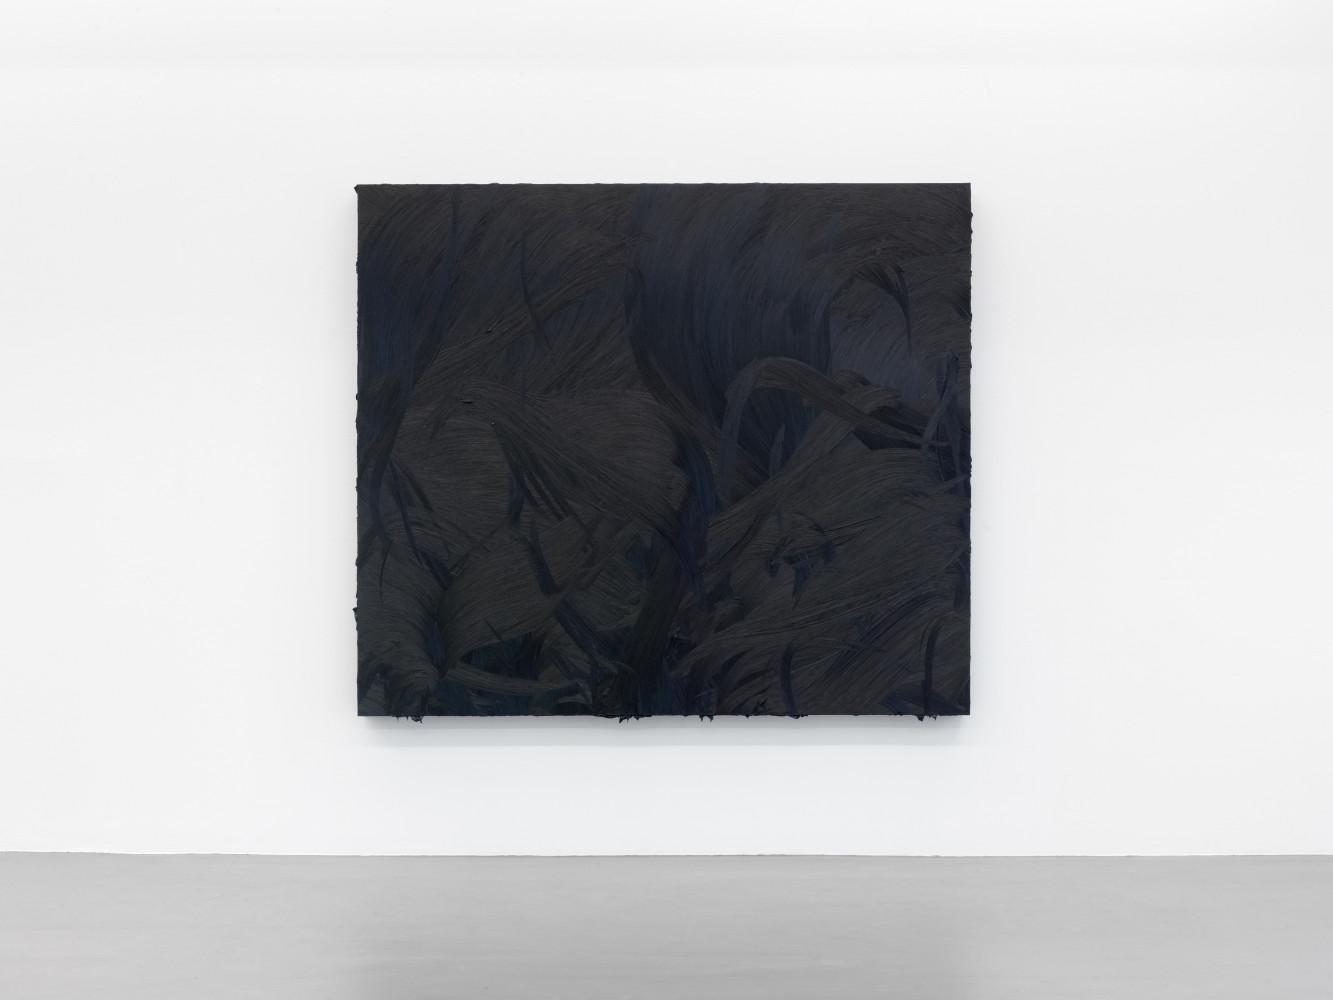 Jason Martin, 'Ruhollah', 2014